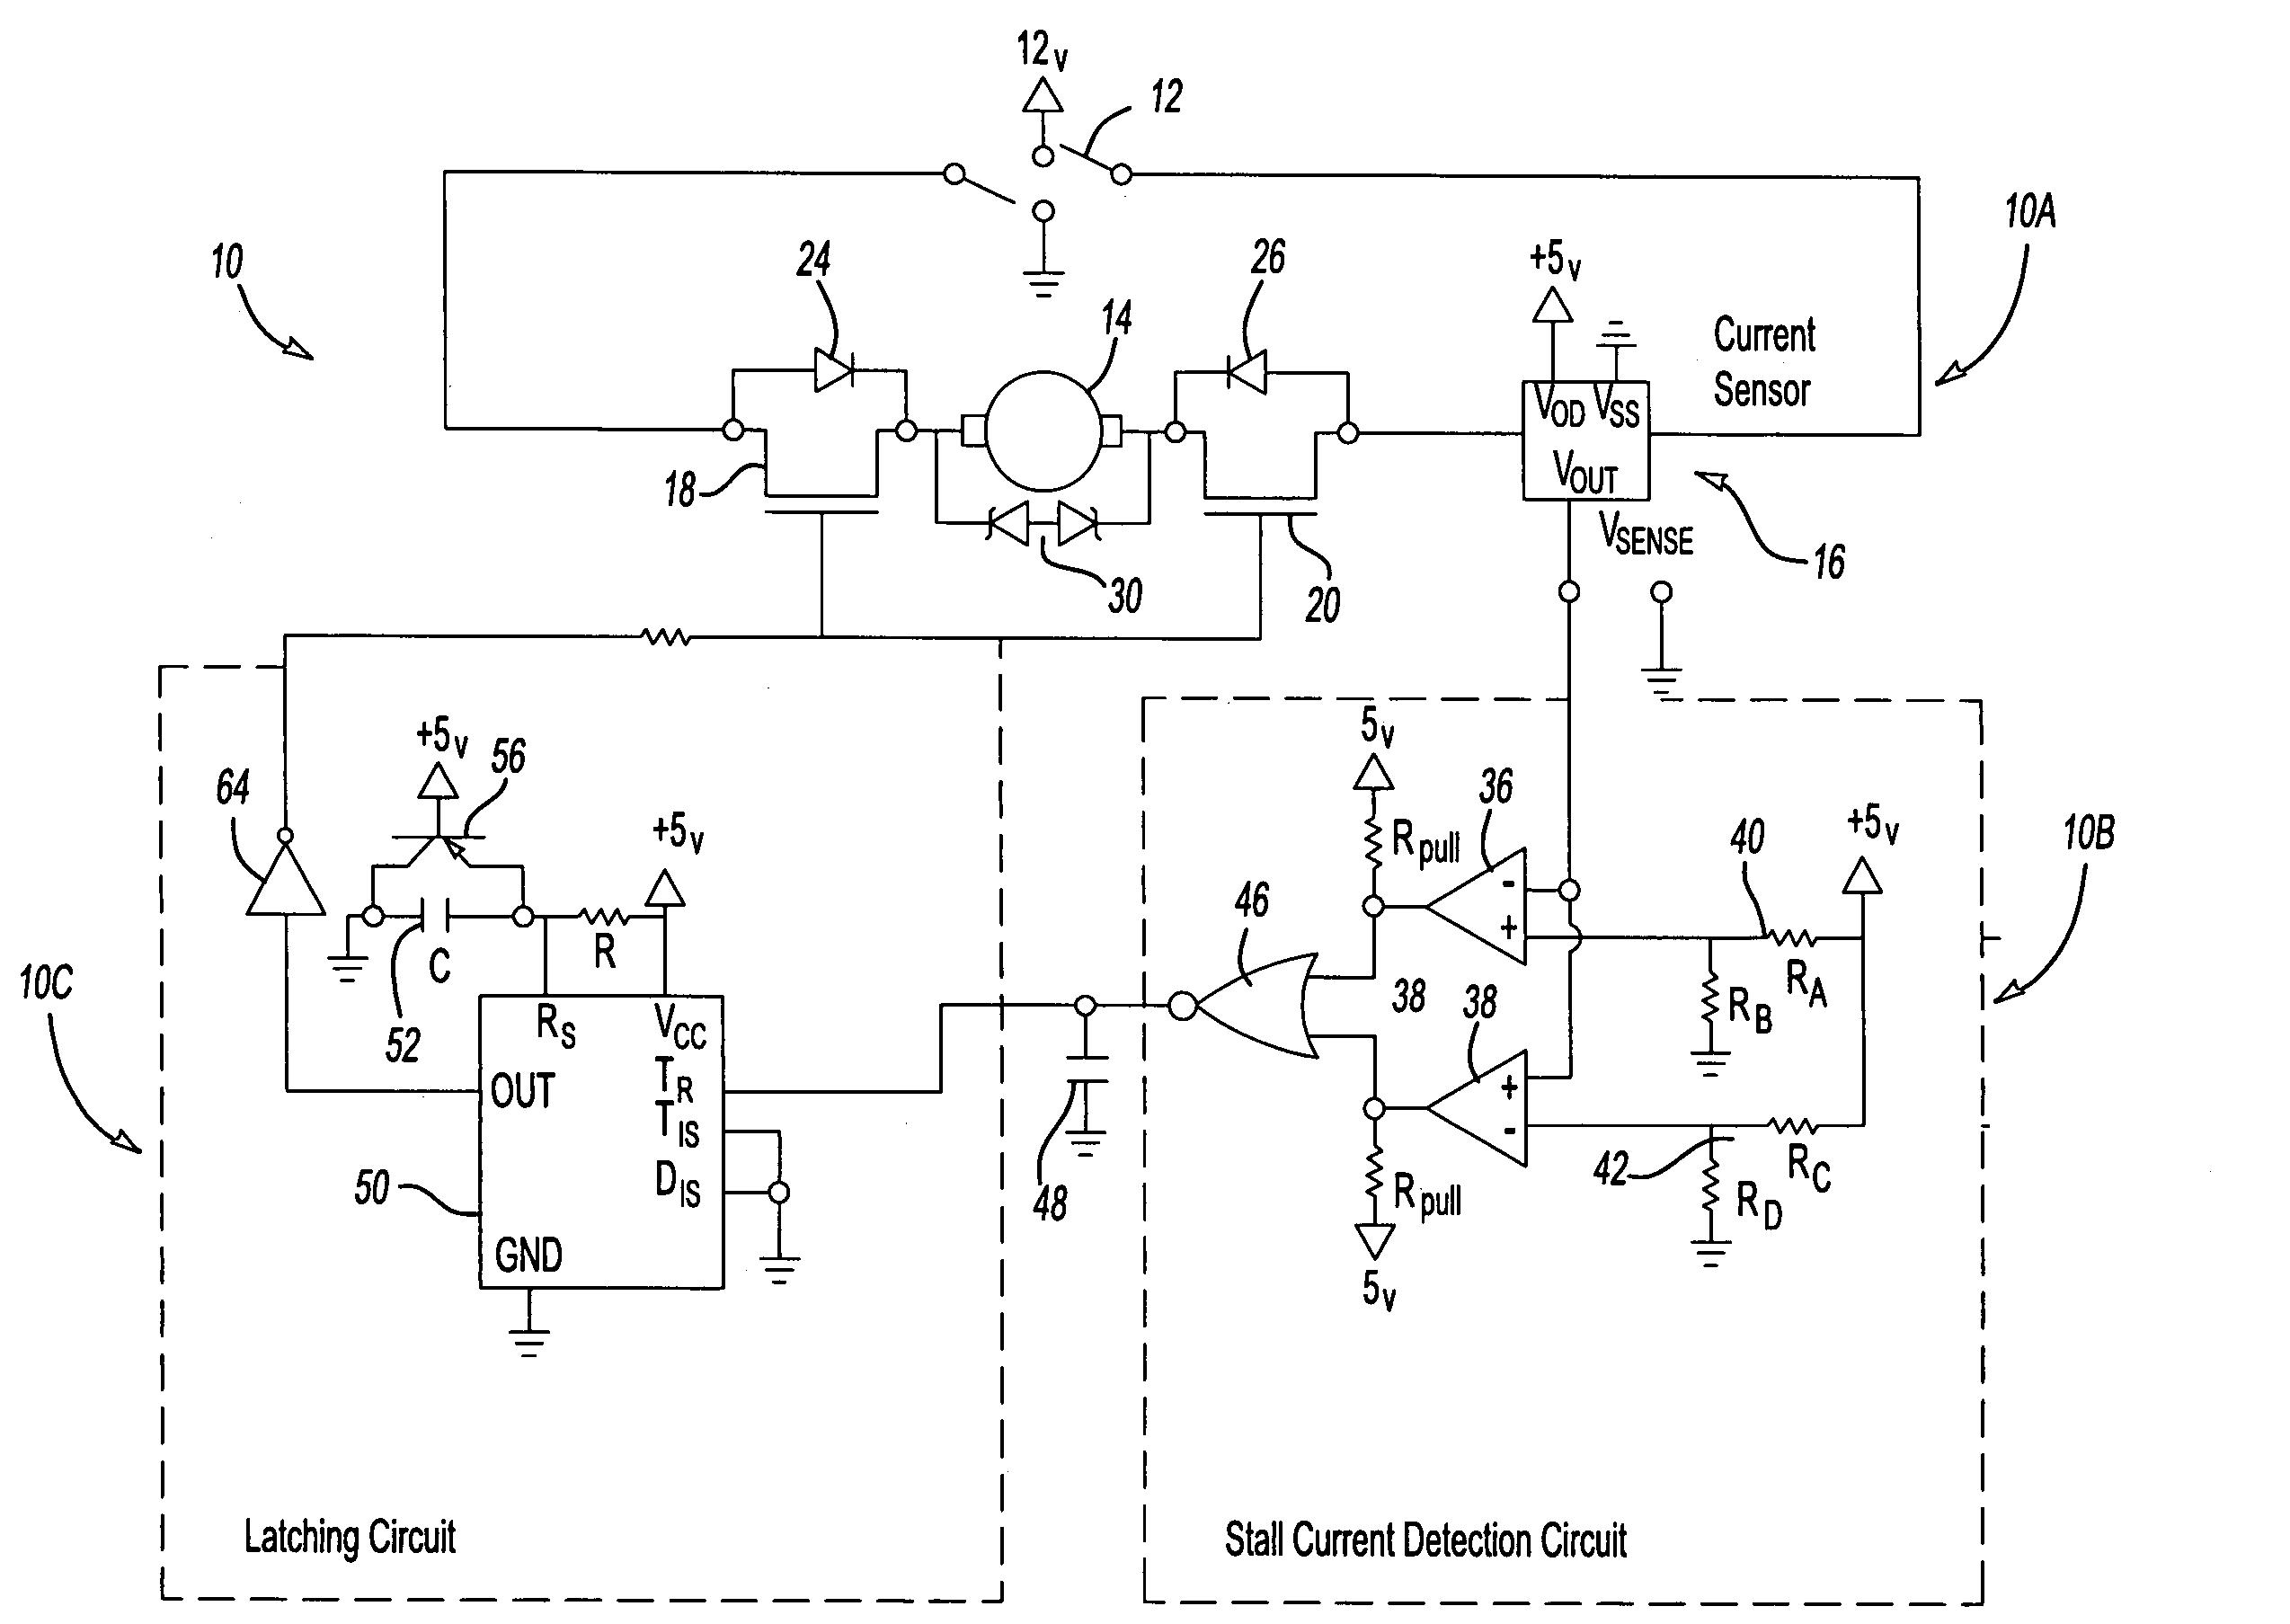 Patent Us7633252 Bidirectional Motor Stall Protection Circuit Pulse Width Modulator With Ne555 Timeroscillator Drawing